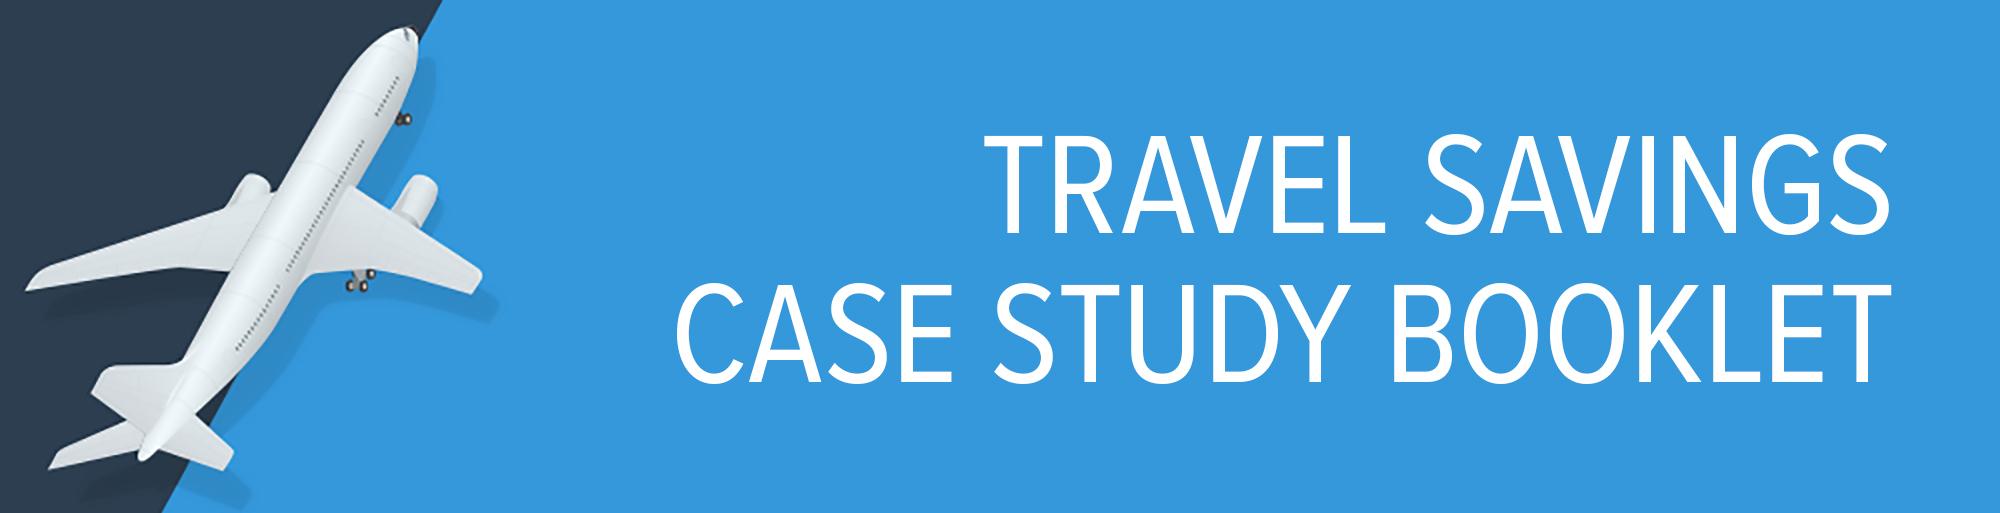 case-study-banner copy.jpg